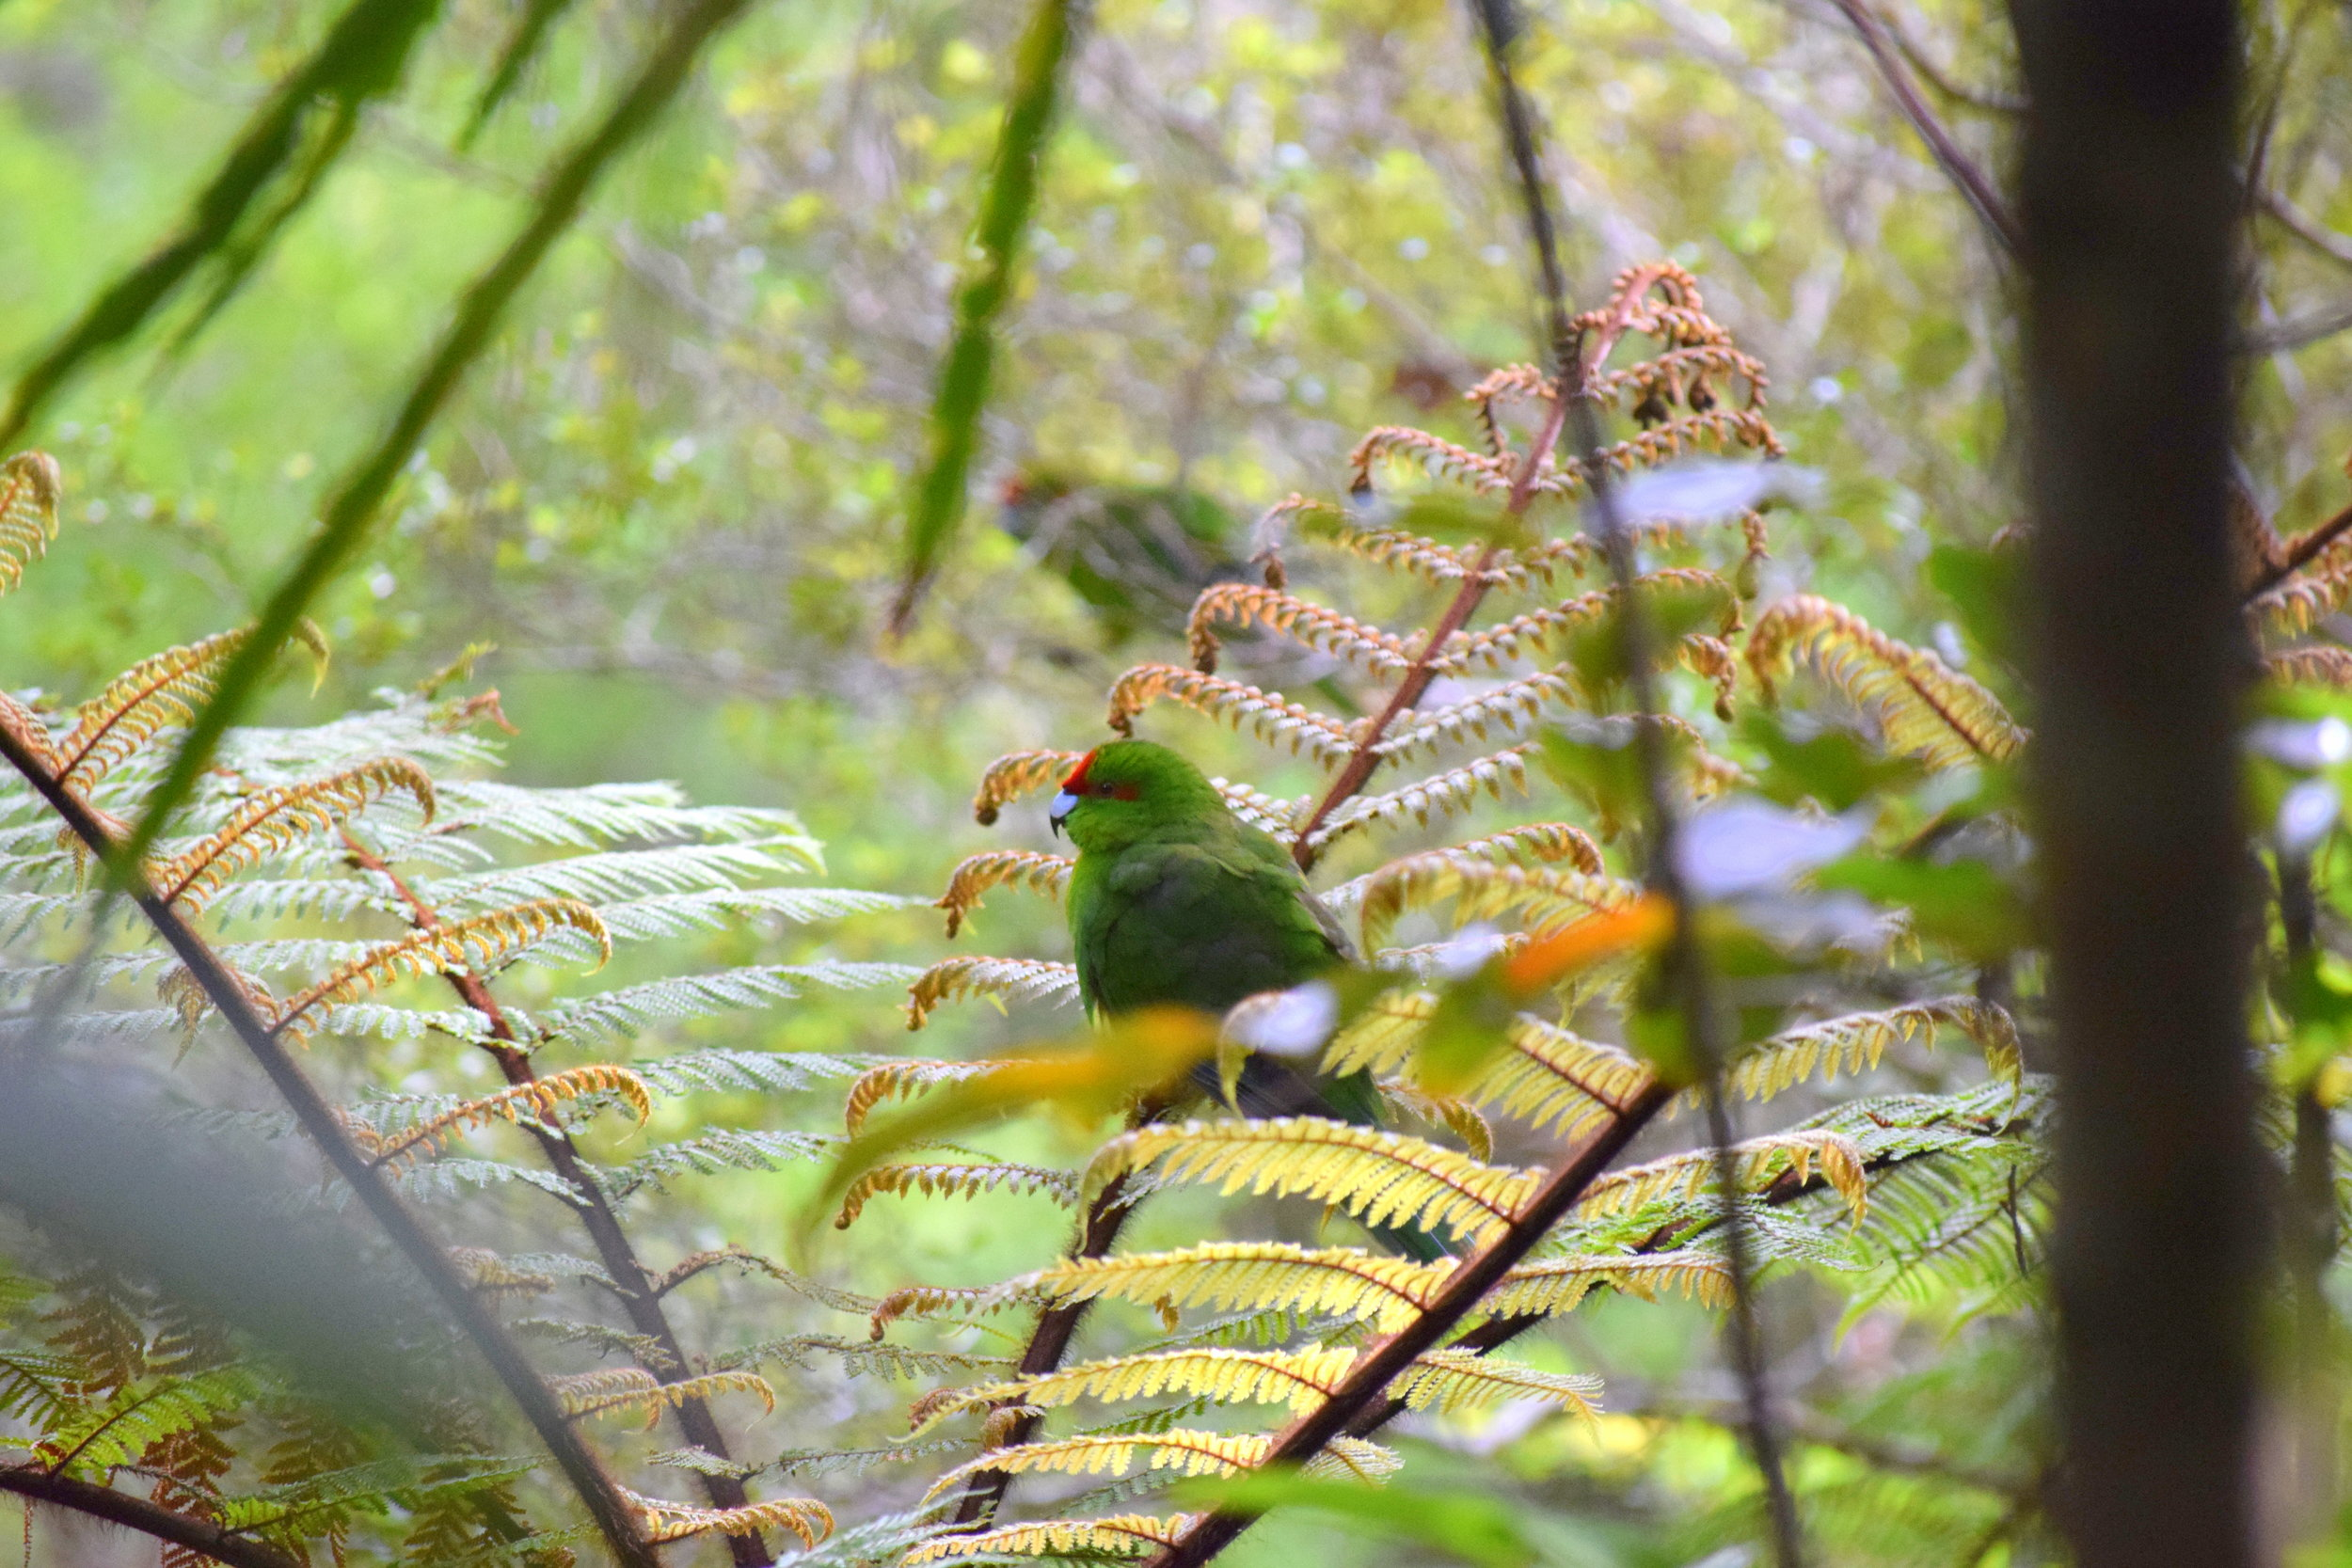 A pair of kakariki (NZ native parakeets) perch in tree ferns on Ulva Island.